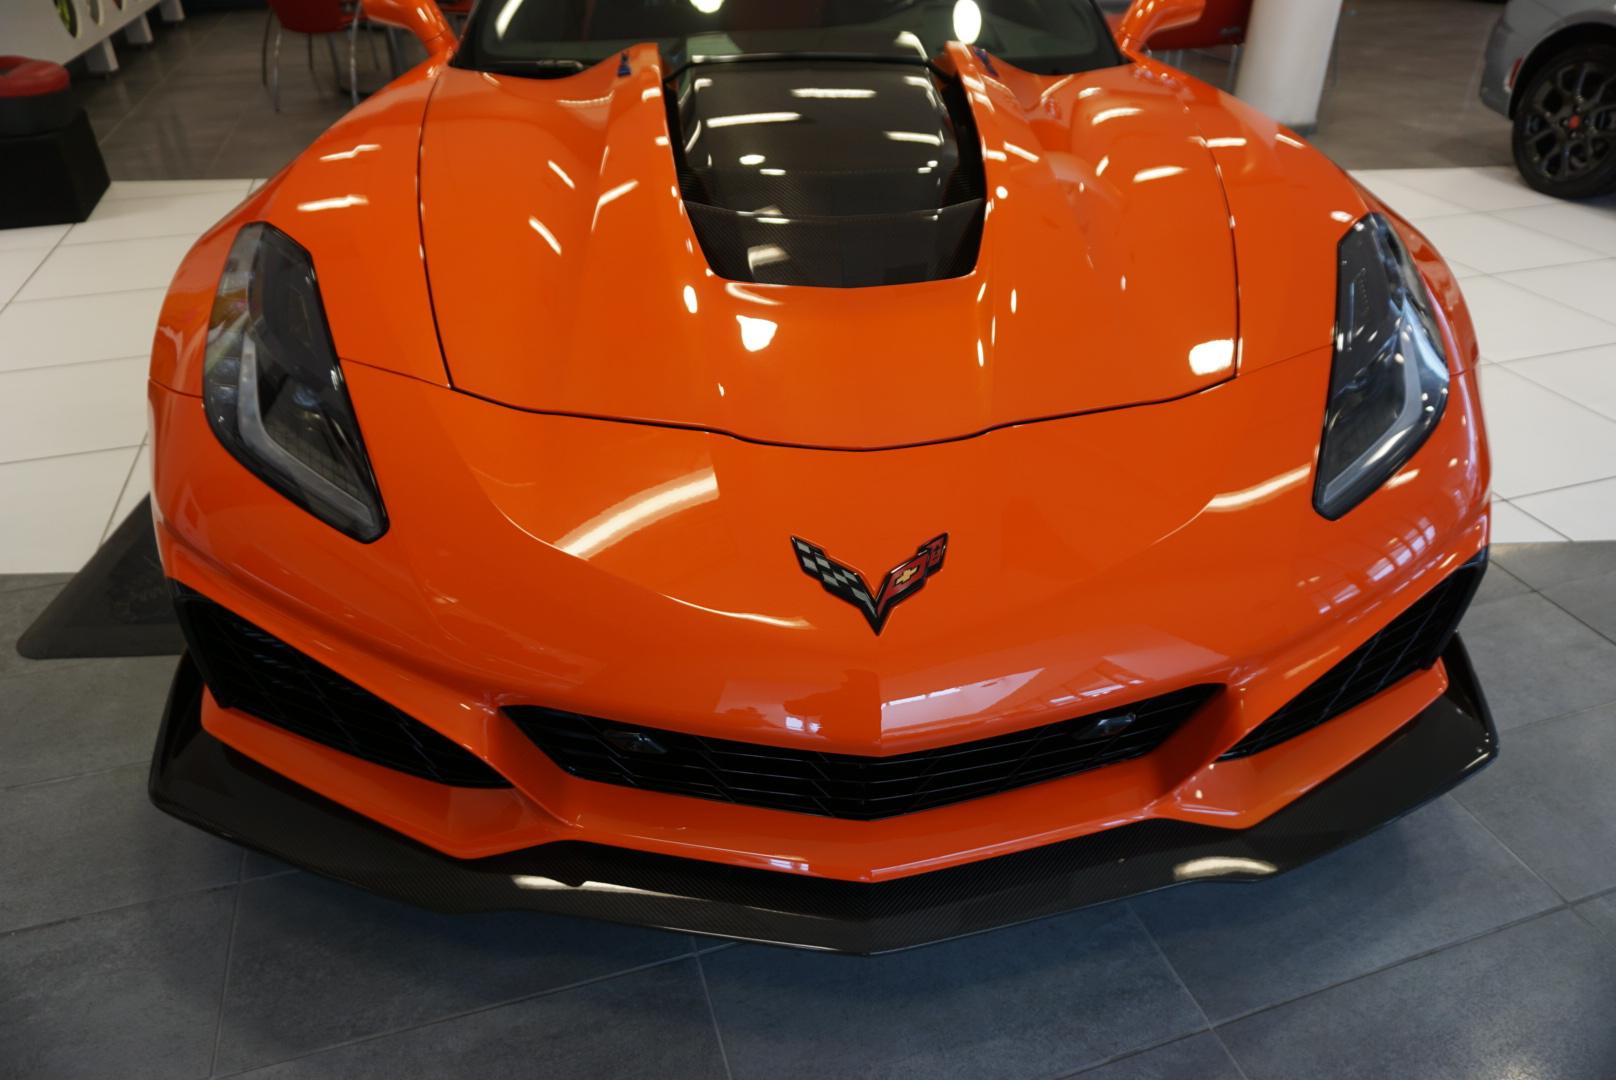 New Car Preparation Package of 2018 Chevrolet Corvette